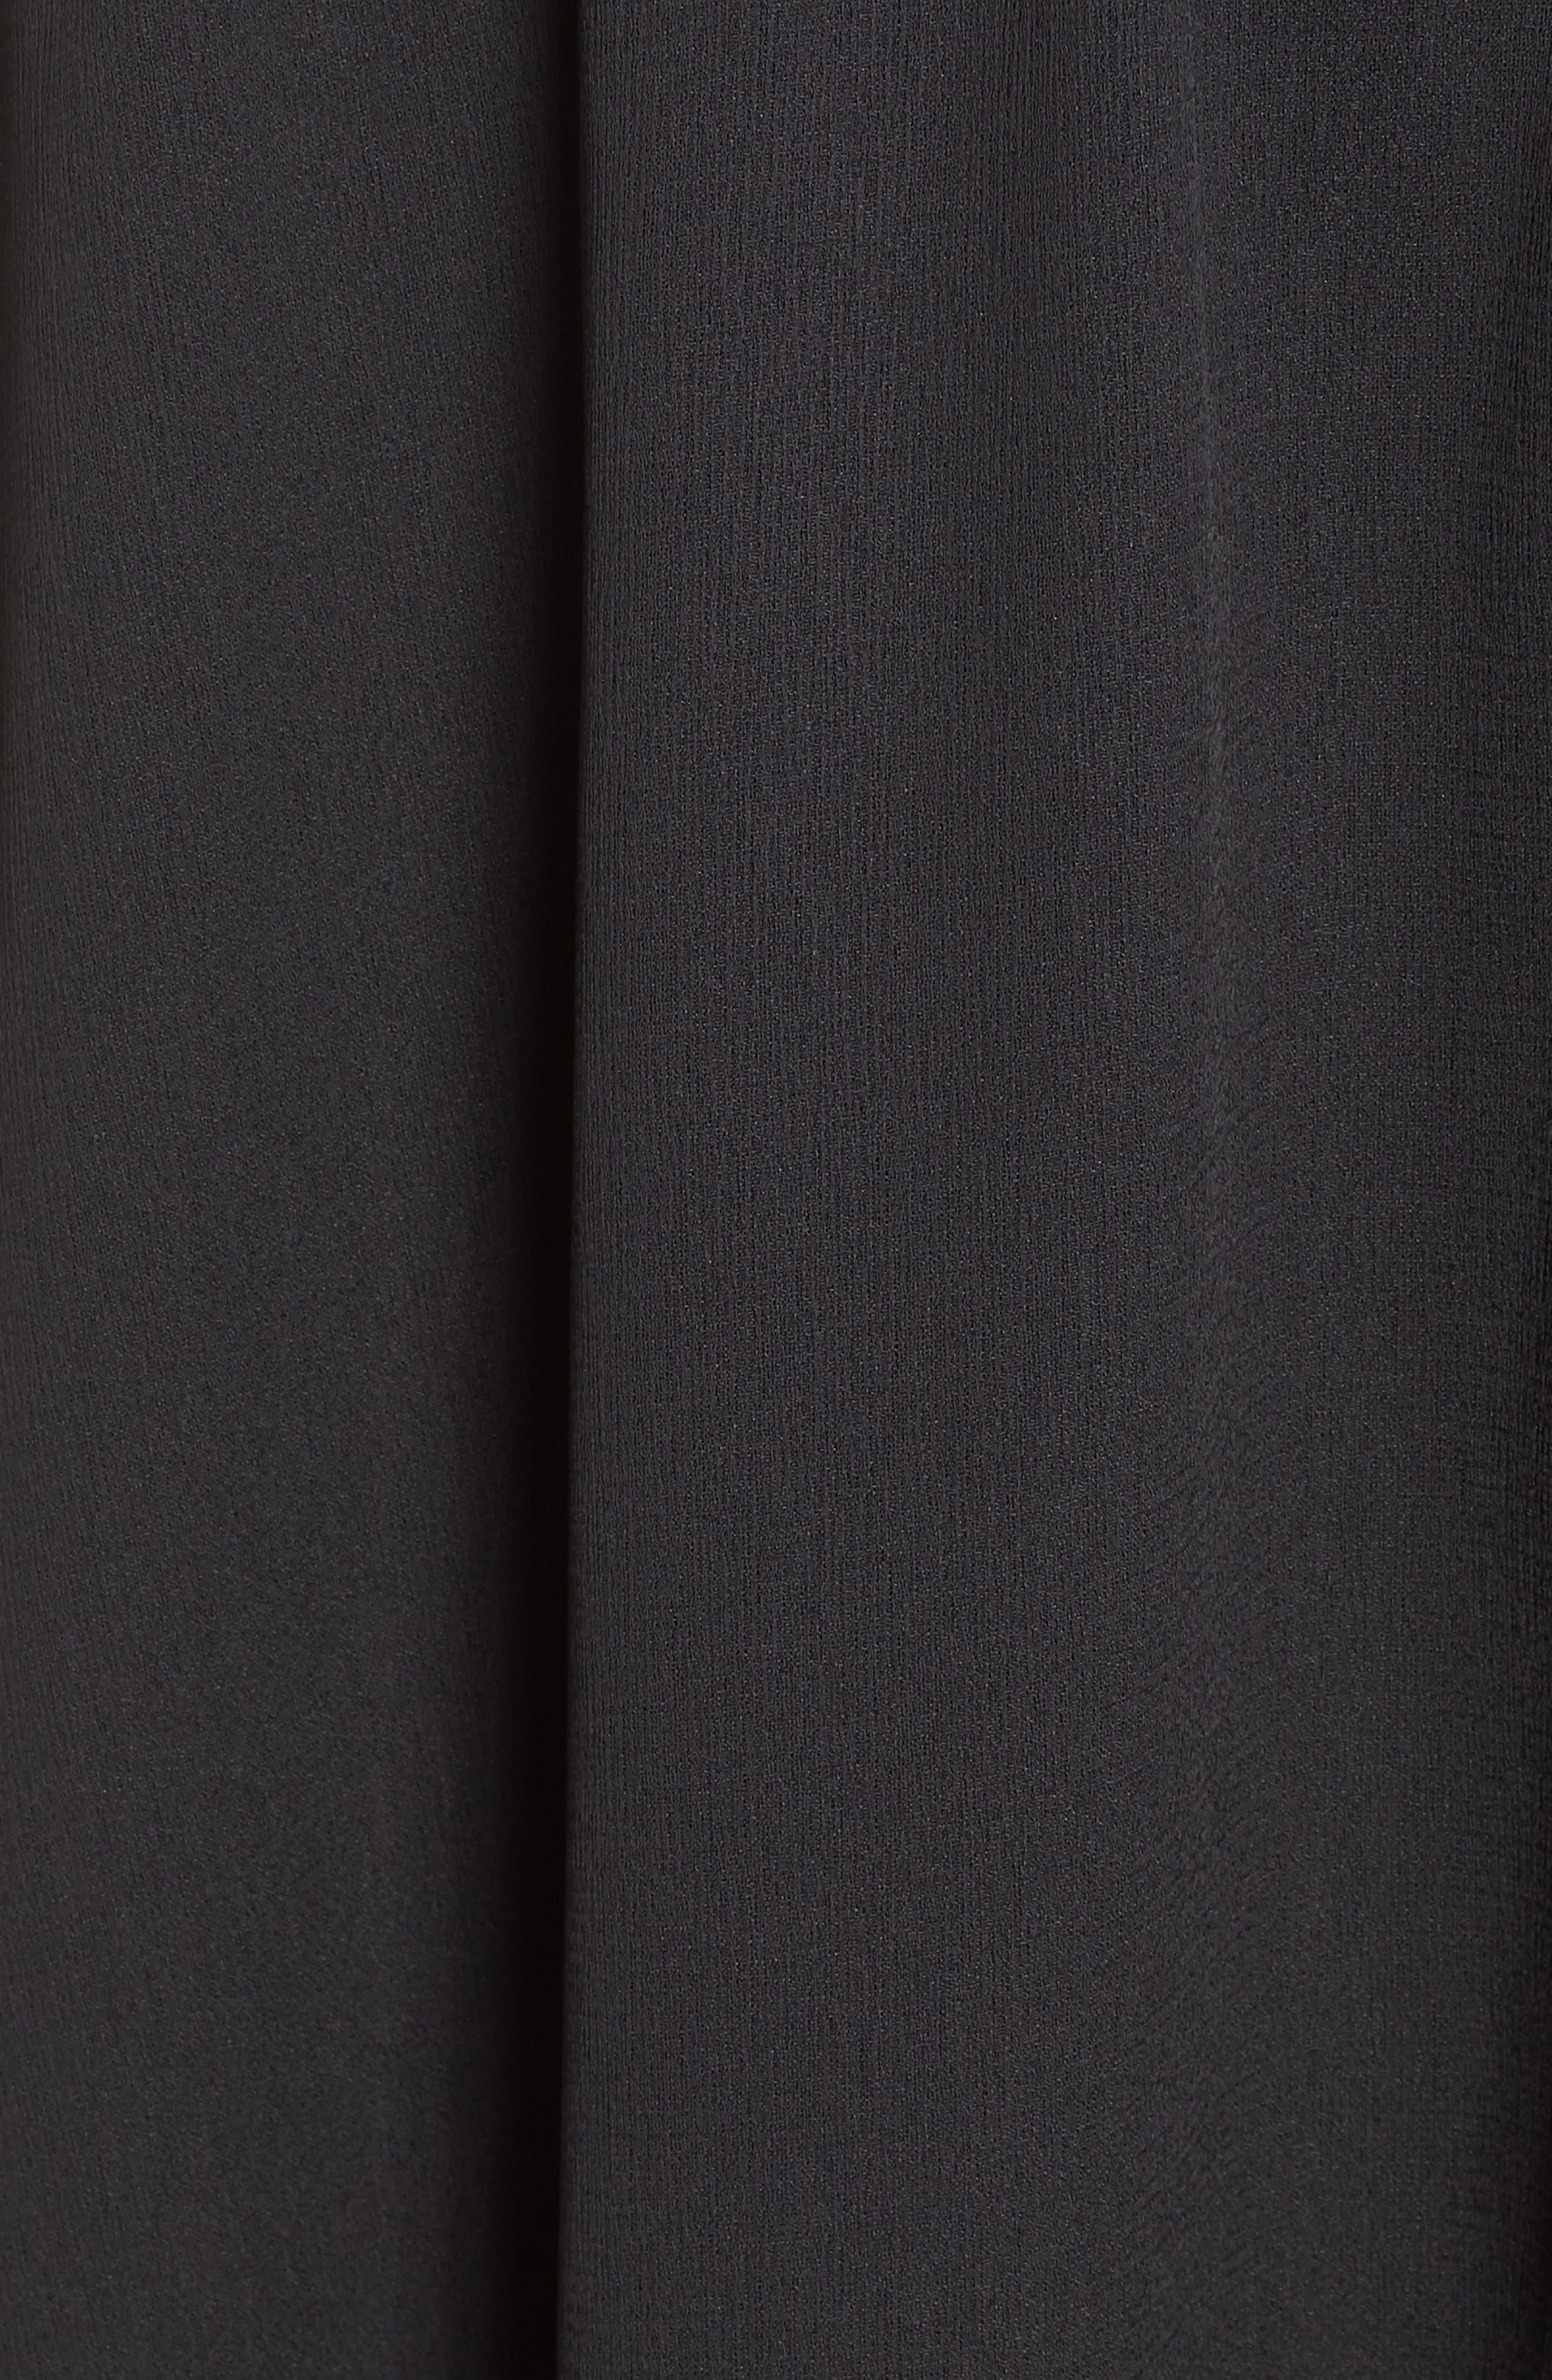 One-Shoulder Asymmetrical Dress,                             Alternate thumbnail 6, color,                             001